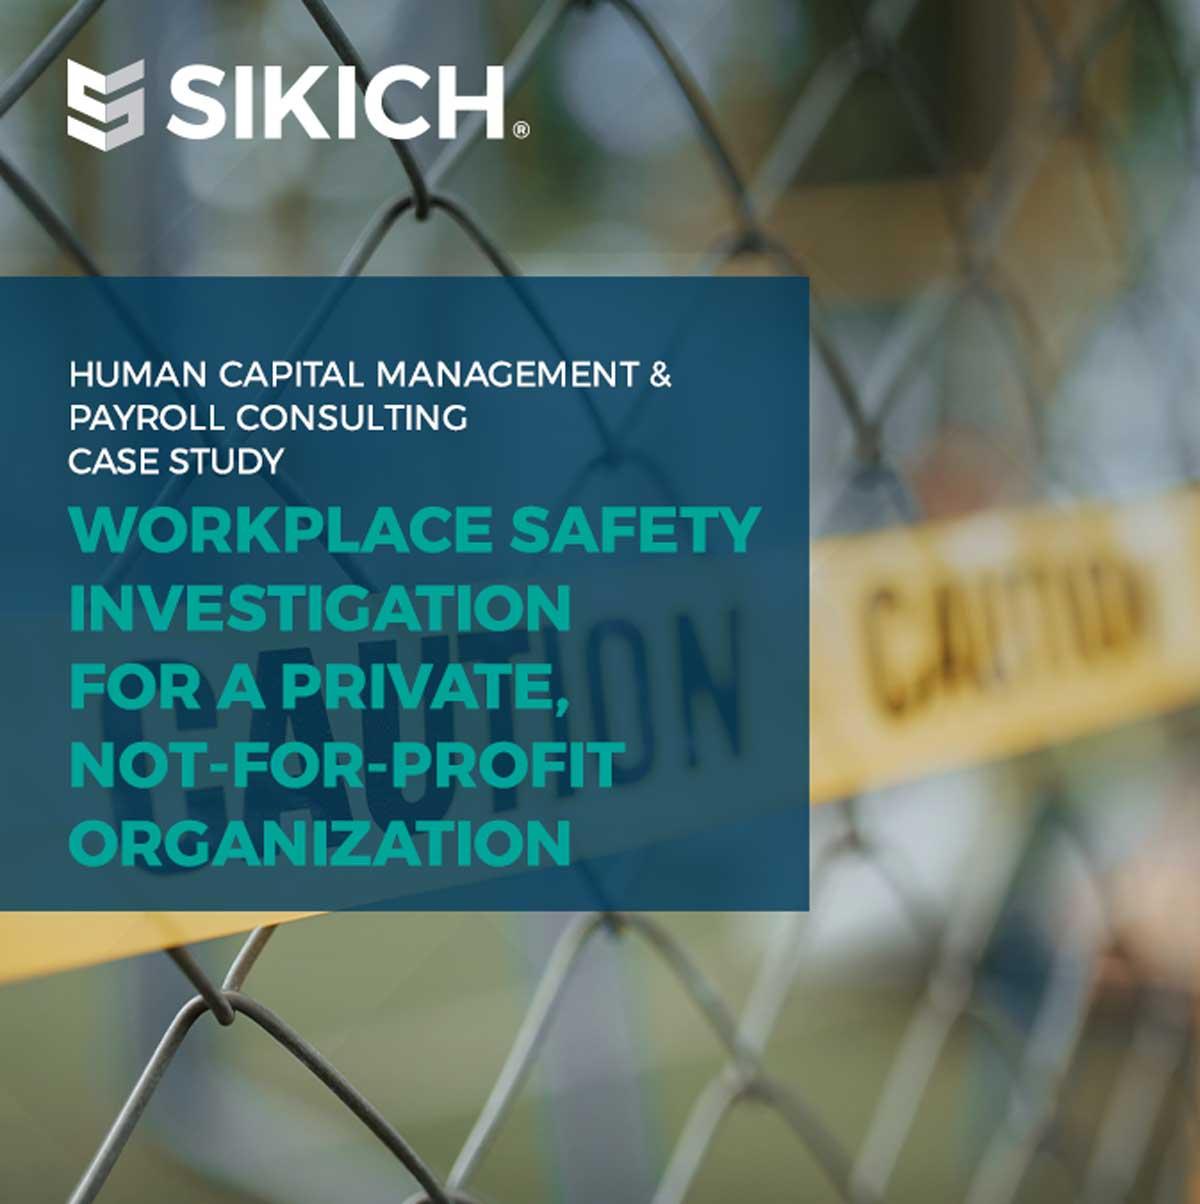 Sikich Workplace Safety Investigation